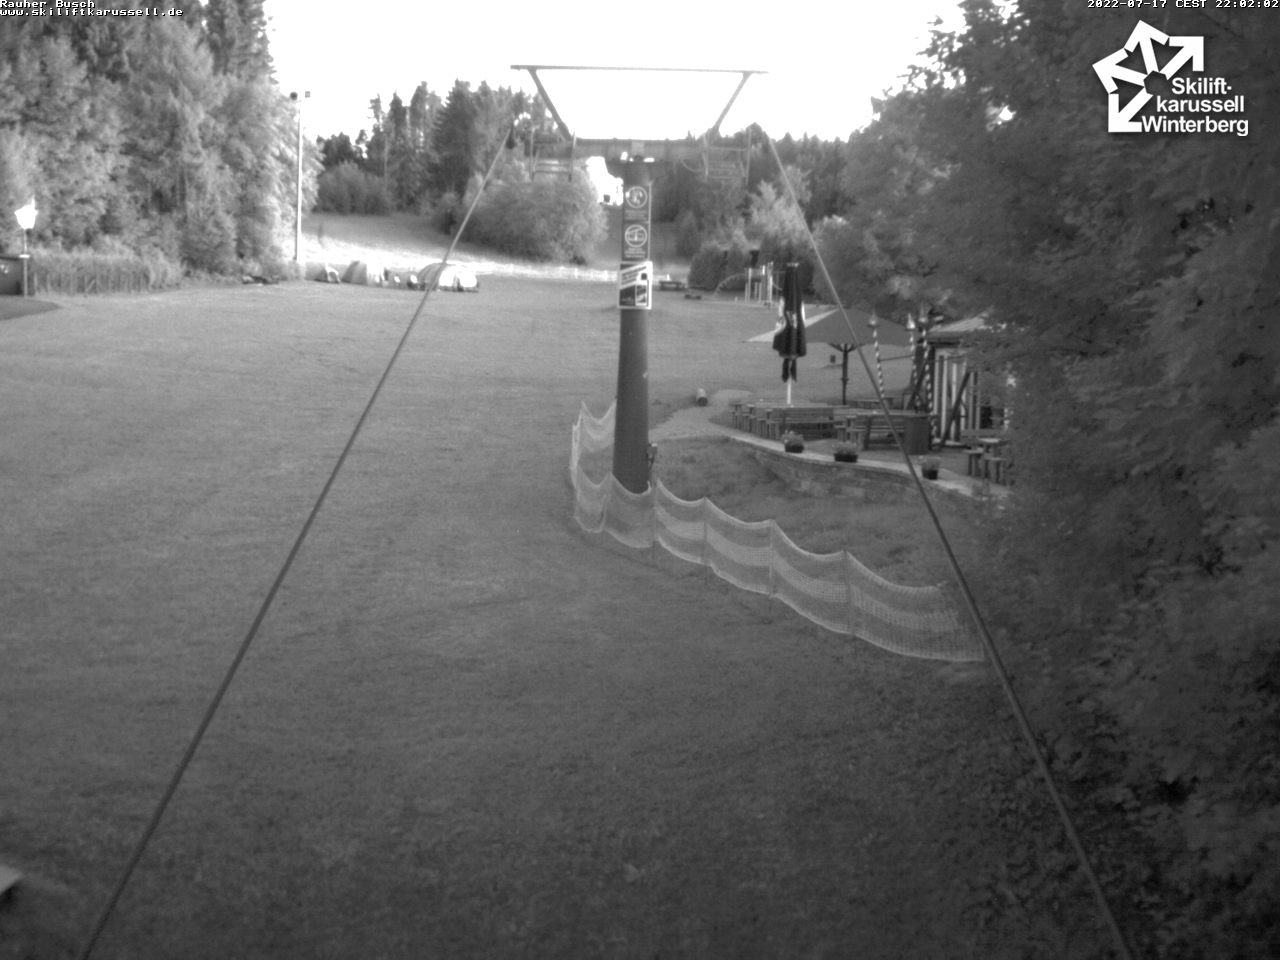 Webcam Rauher Busch - Skilifkarussell Winterberg